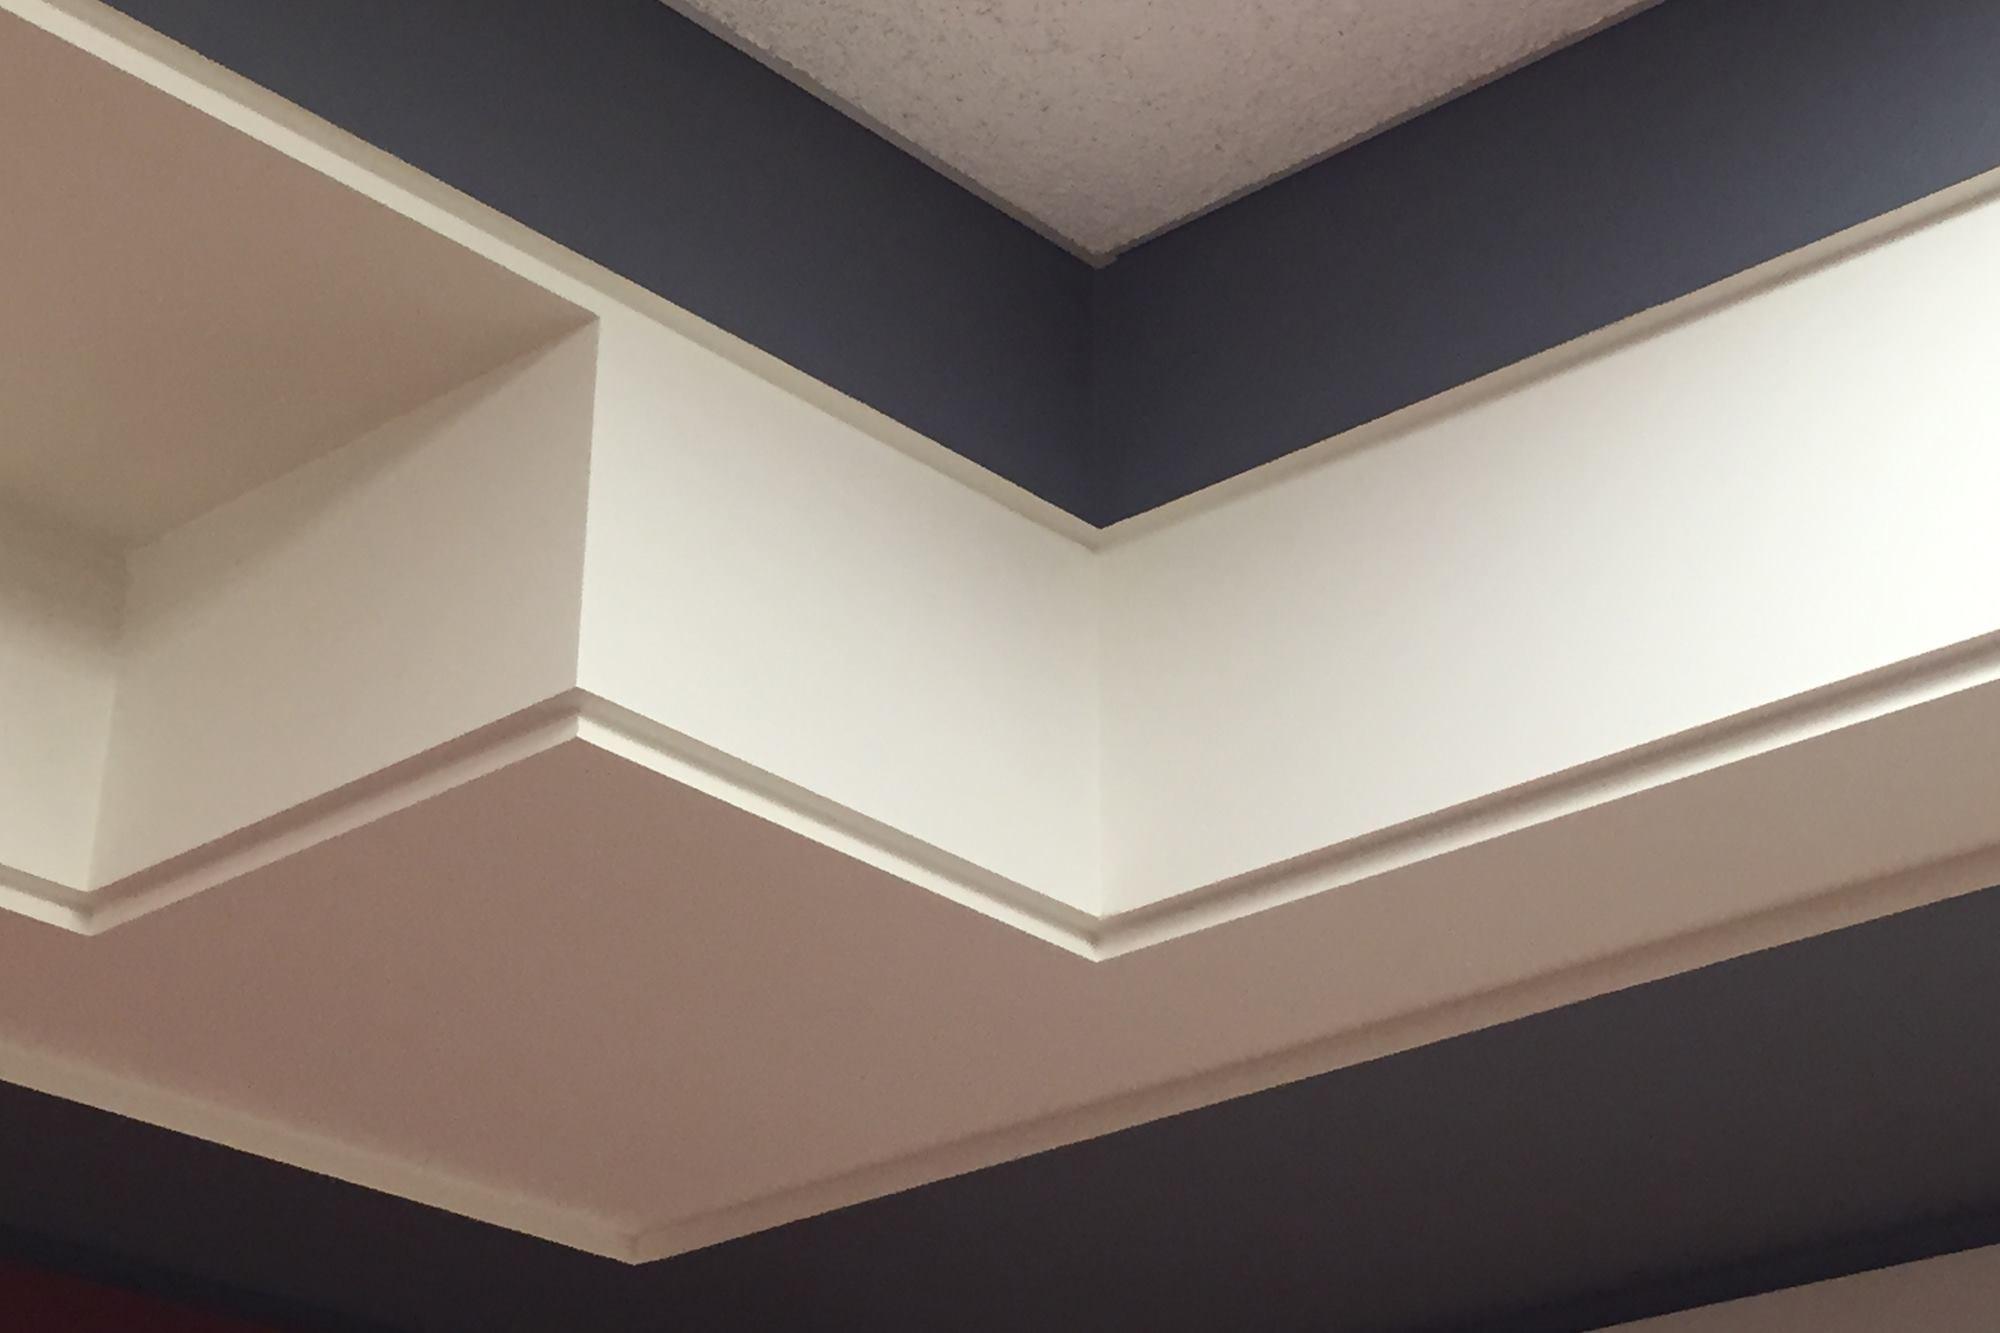 Trim tex reveal 90 degree corner bead jlc online - Interior design jobs without a degree ...